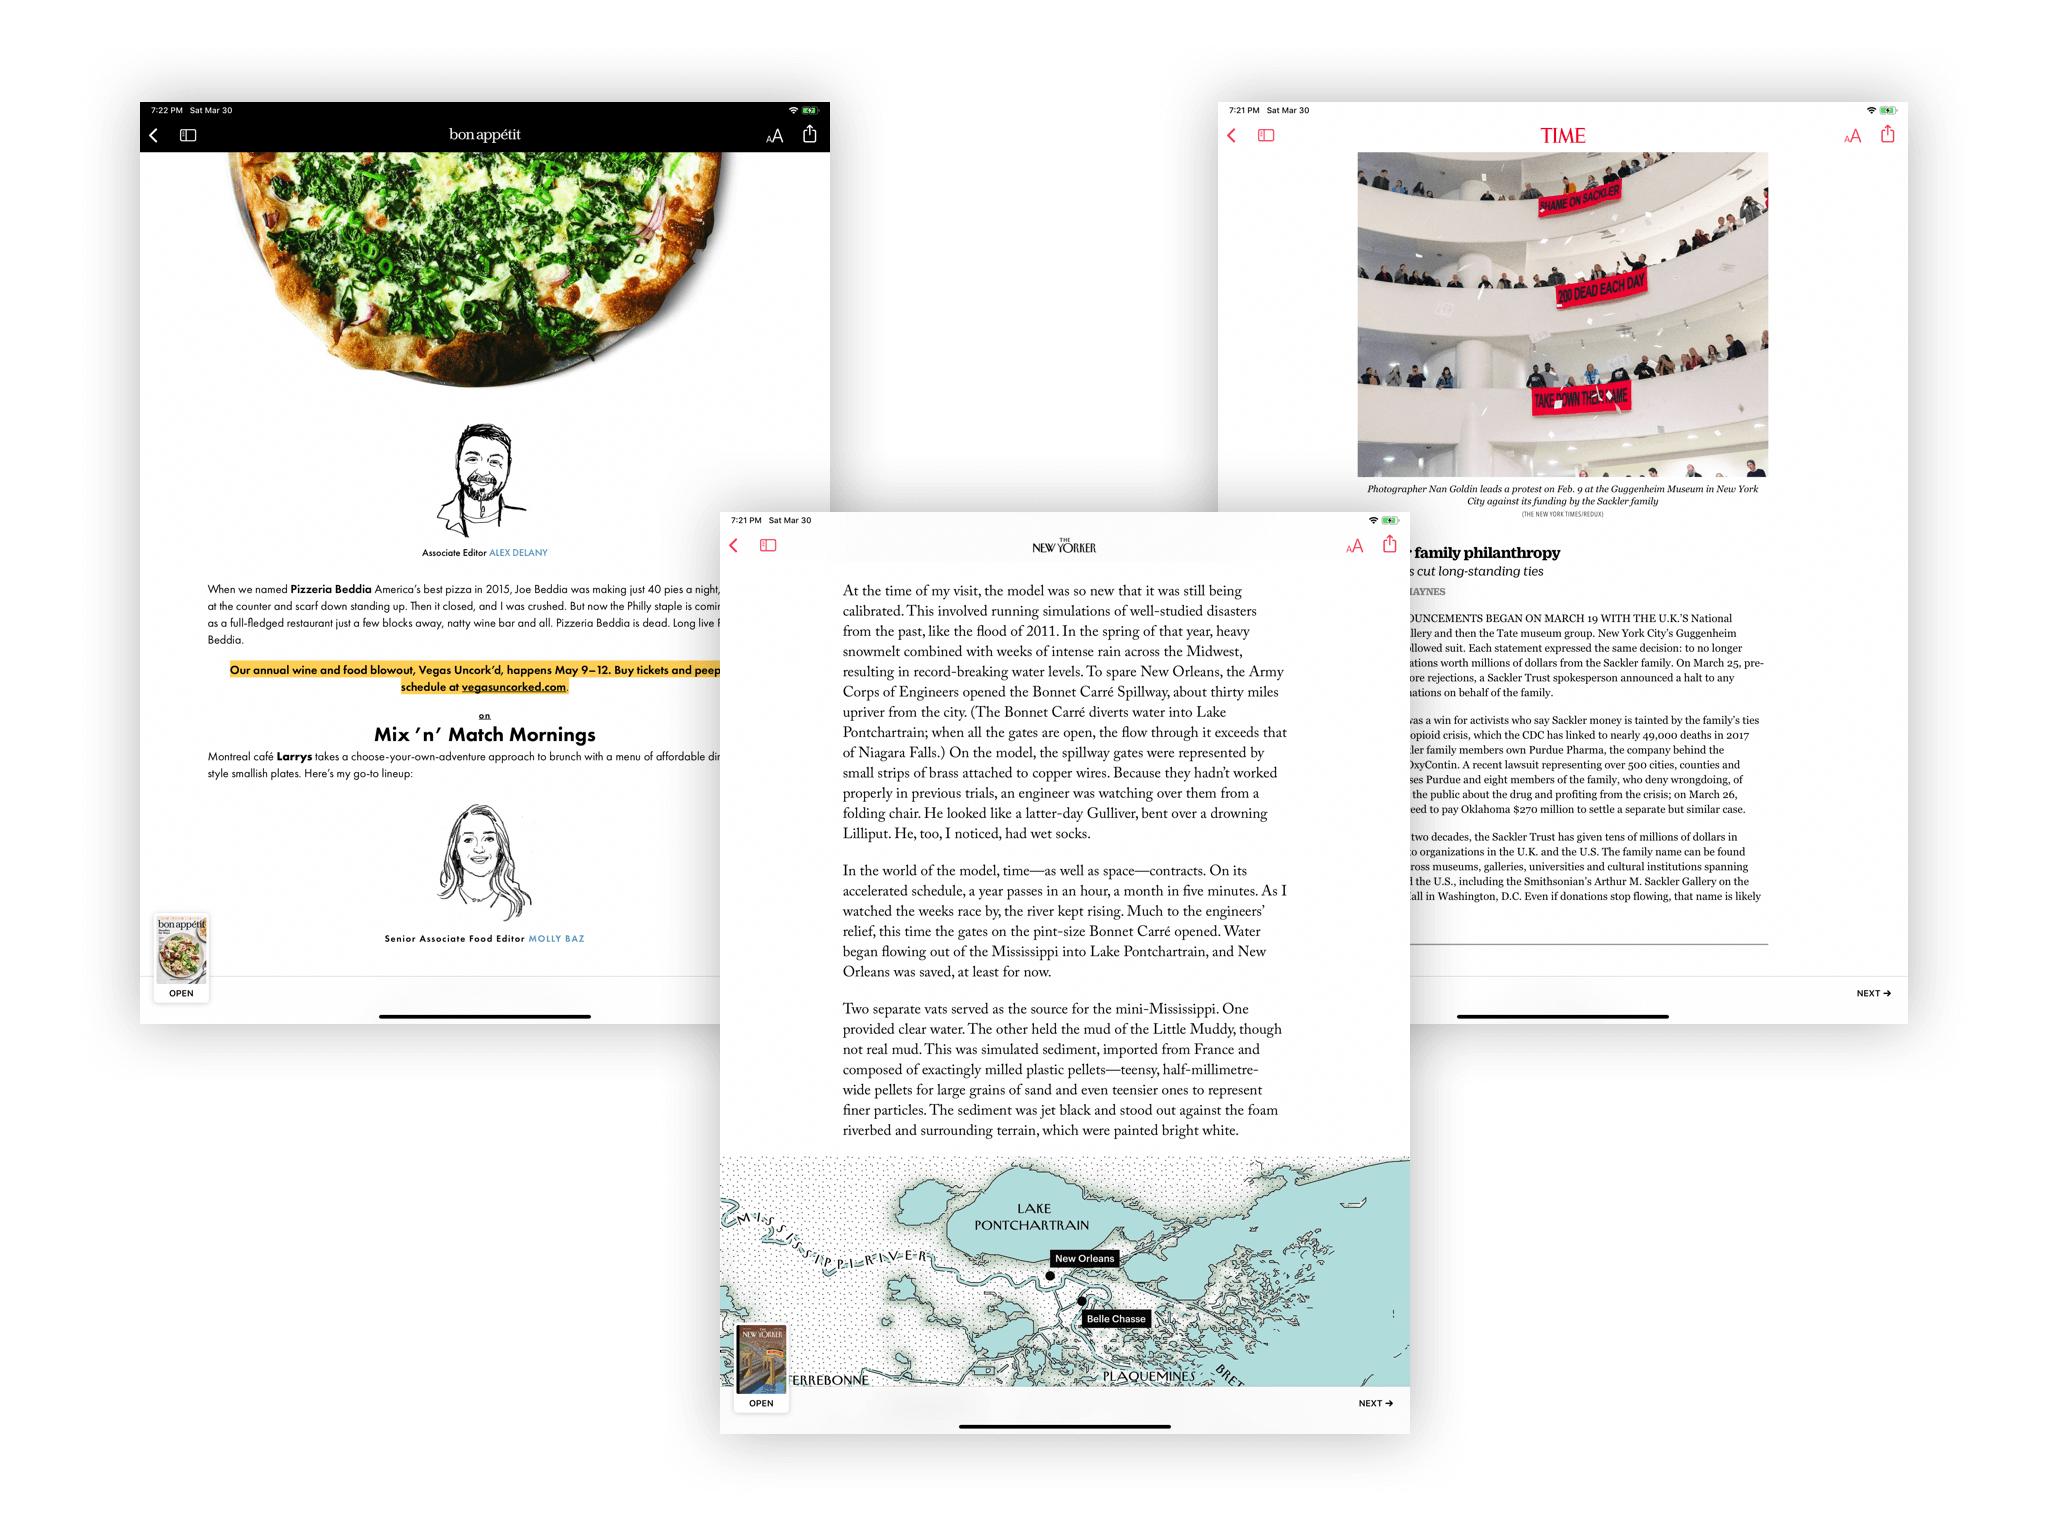 Apple News+ 的内文阅读界面